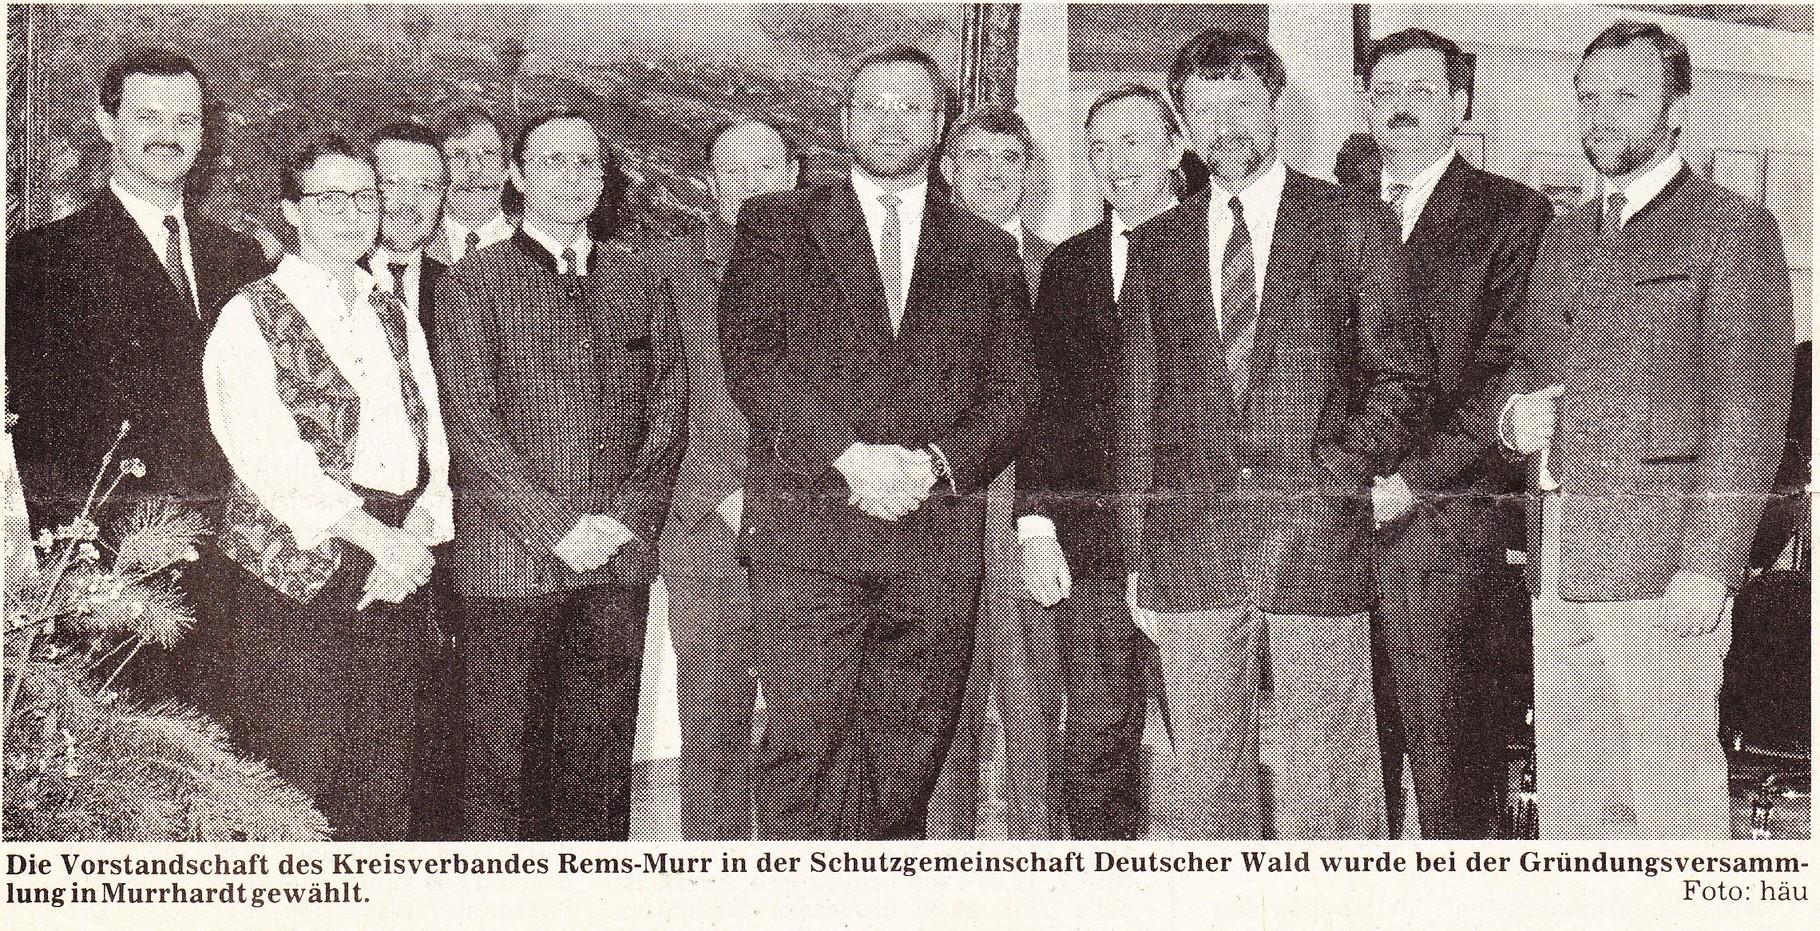 SDW-Gründungsvorstand 1990: v.l.: 2. S.Barth, 3.v.l: R. Heitzmann, 4.v.l. P. Wilz, 5.v.l. FDir H.-E Hink, 6.v.l. K. Kugler, 7.v.l. BM U. Burr, 1.v.r. OFR G.Obergfell, 3.v.r. Forstpräsident K. Bauer, 4.v.r. H. Witzig, 5.v.r. H. Schmid